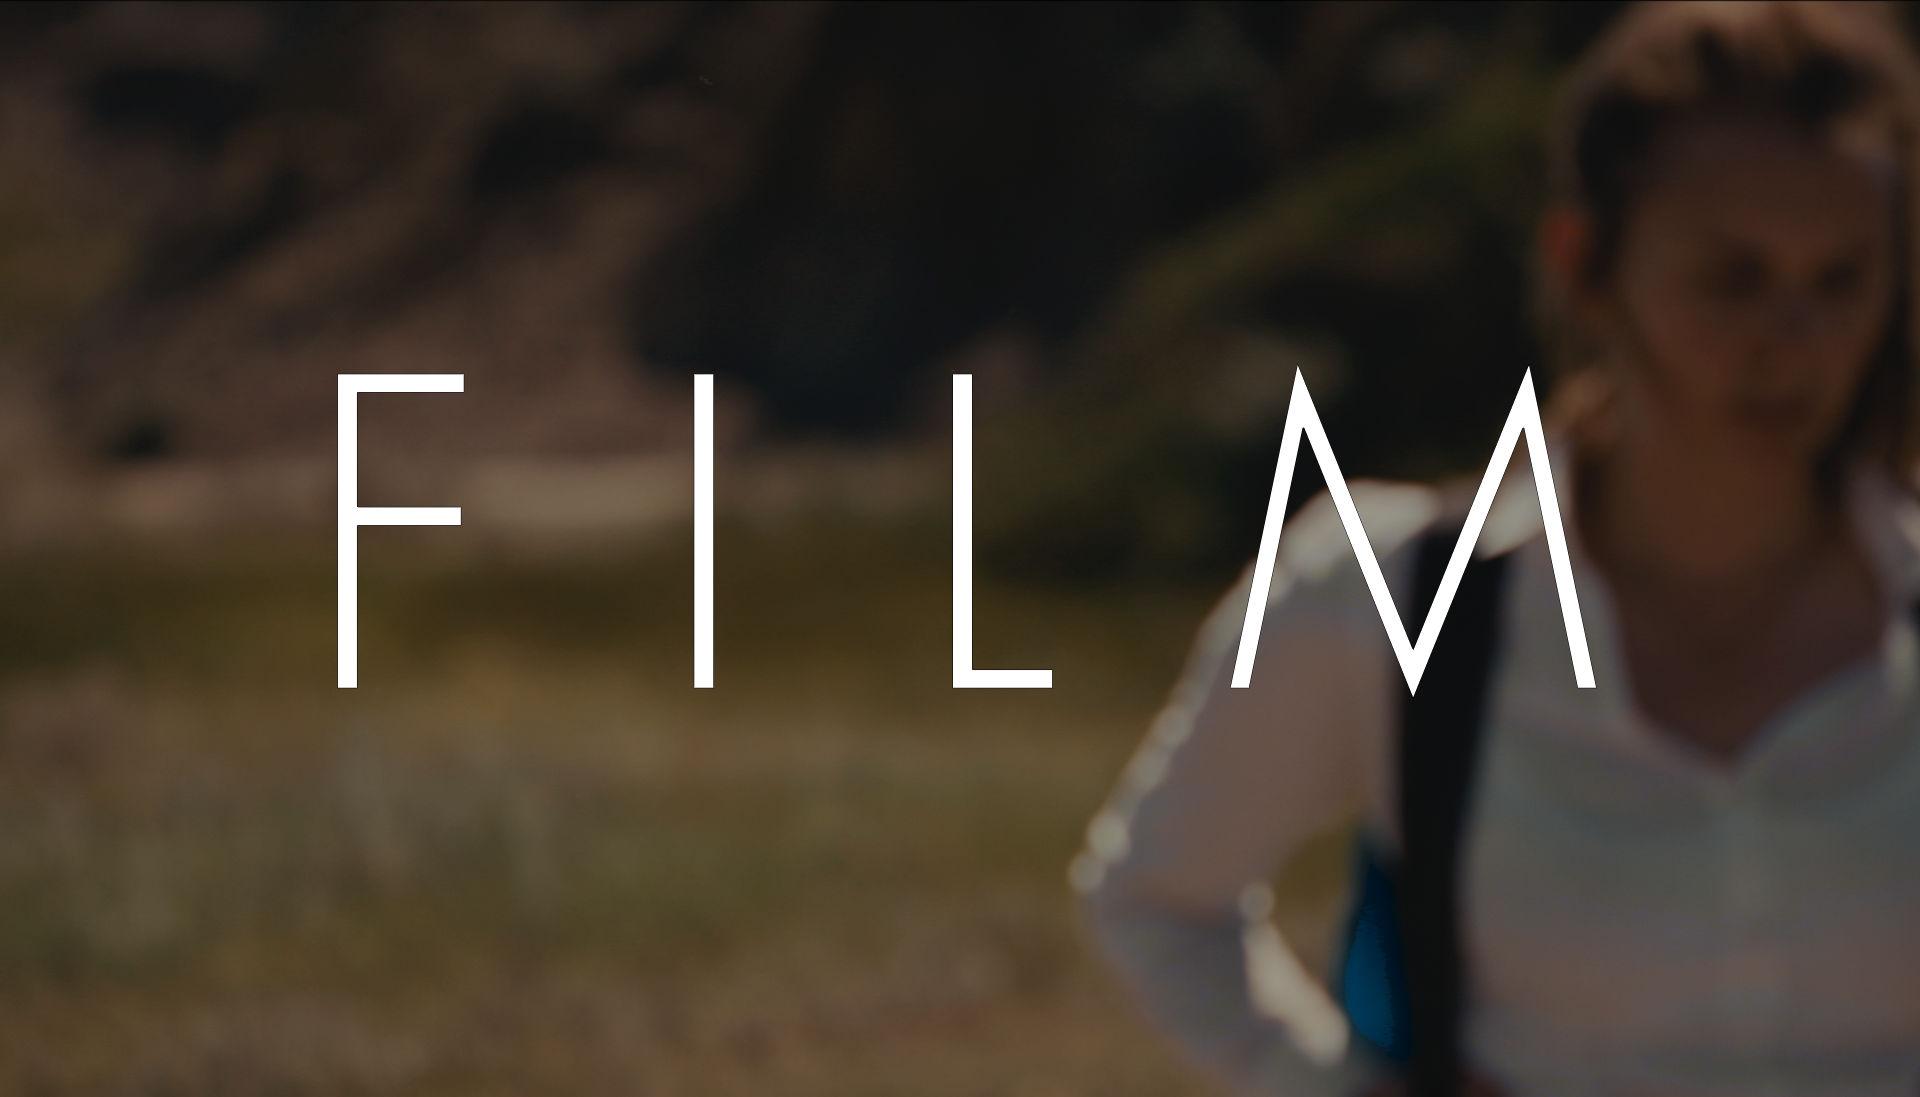 narrative film button.jpg